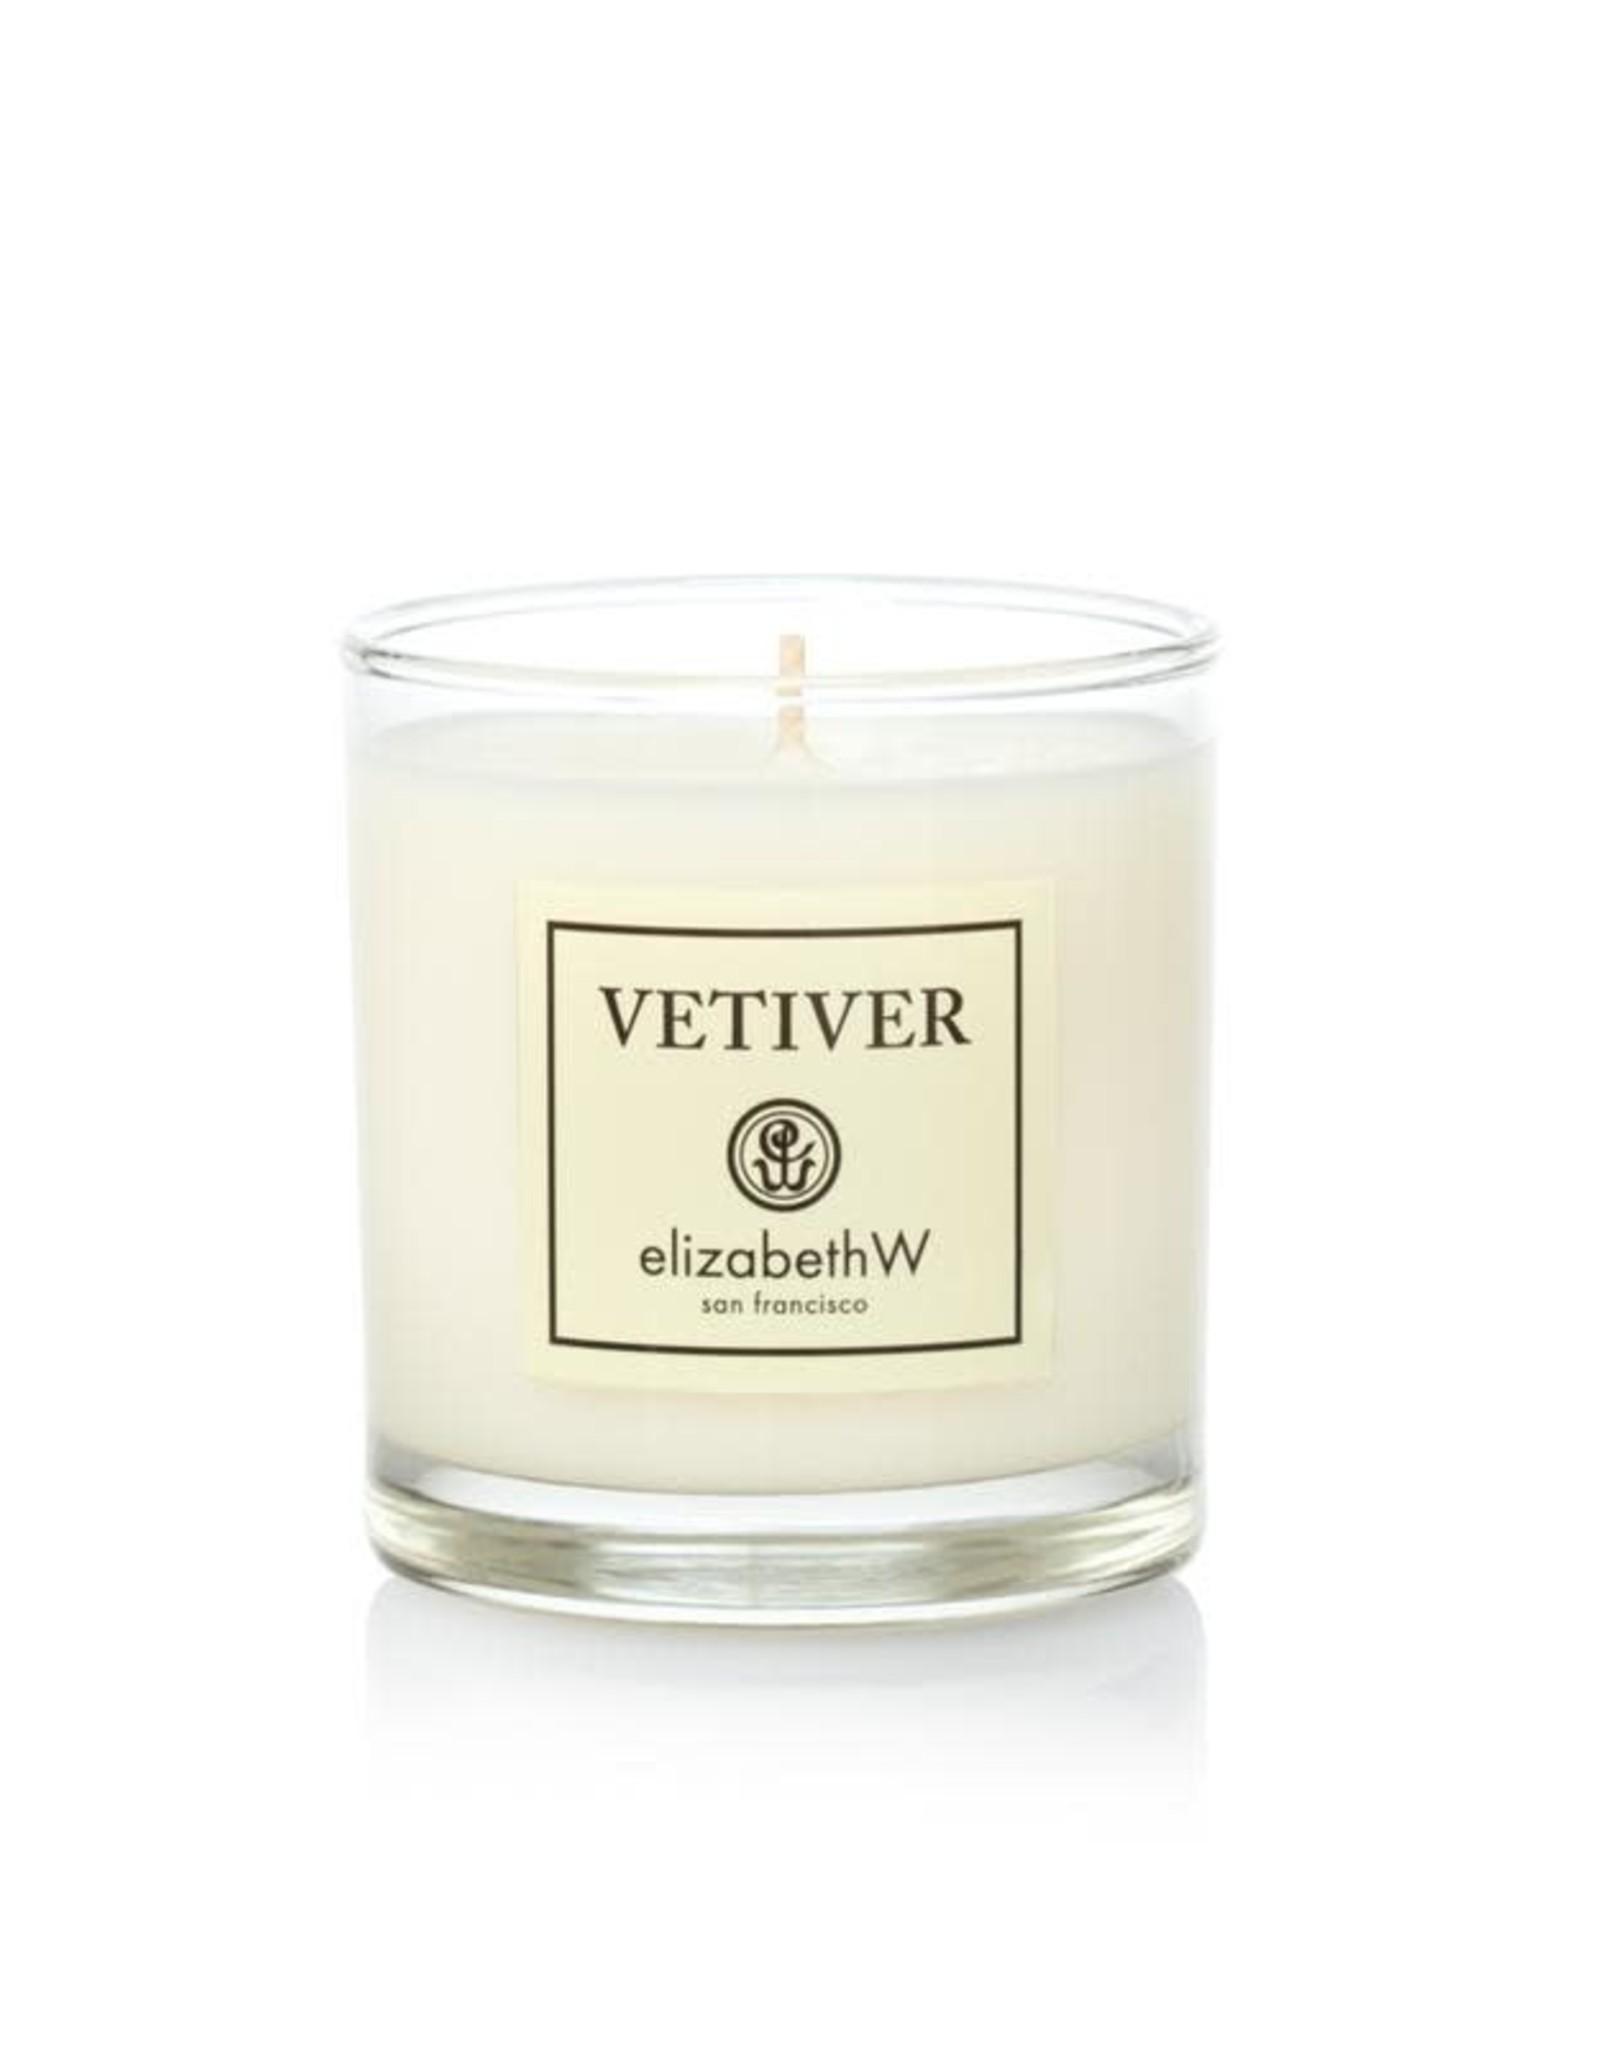 Elizabeth W Vetiver Aromatherapy Candle, 8 oz.